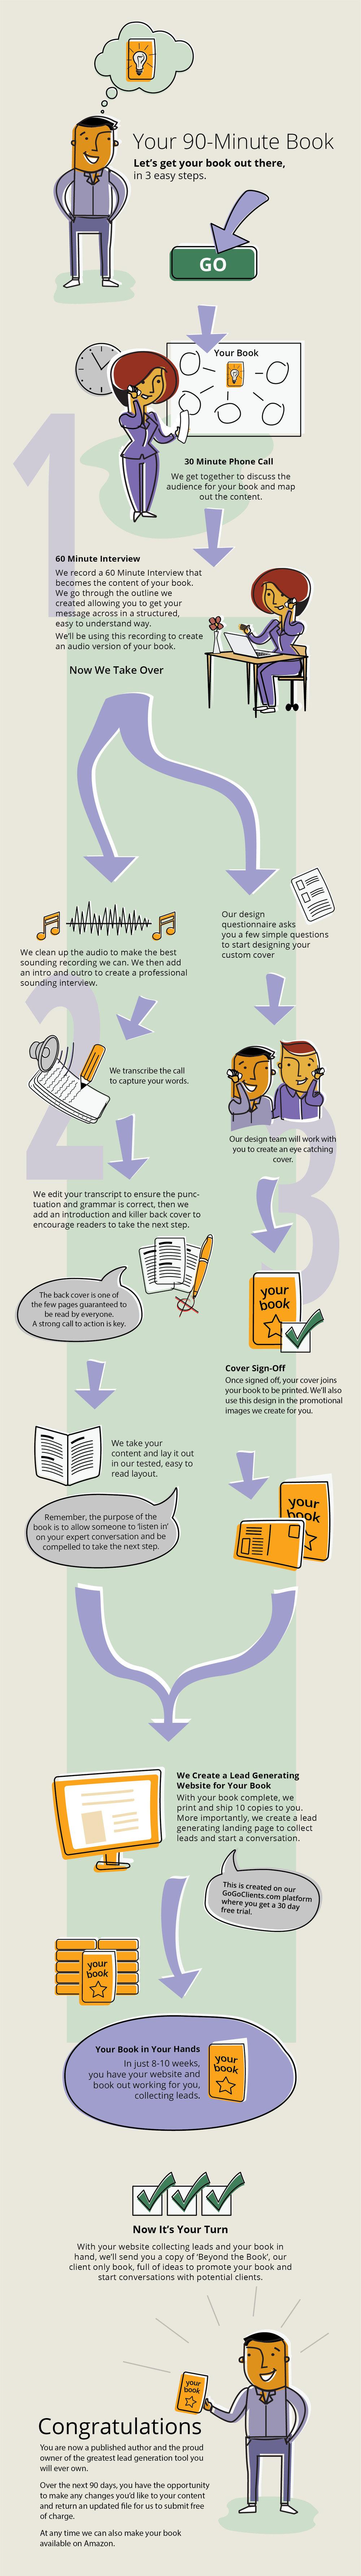 90-Minute Books Process